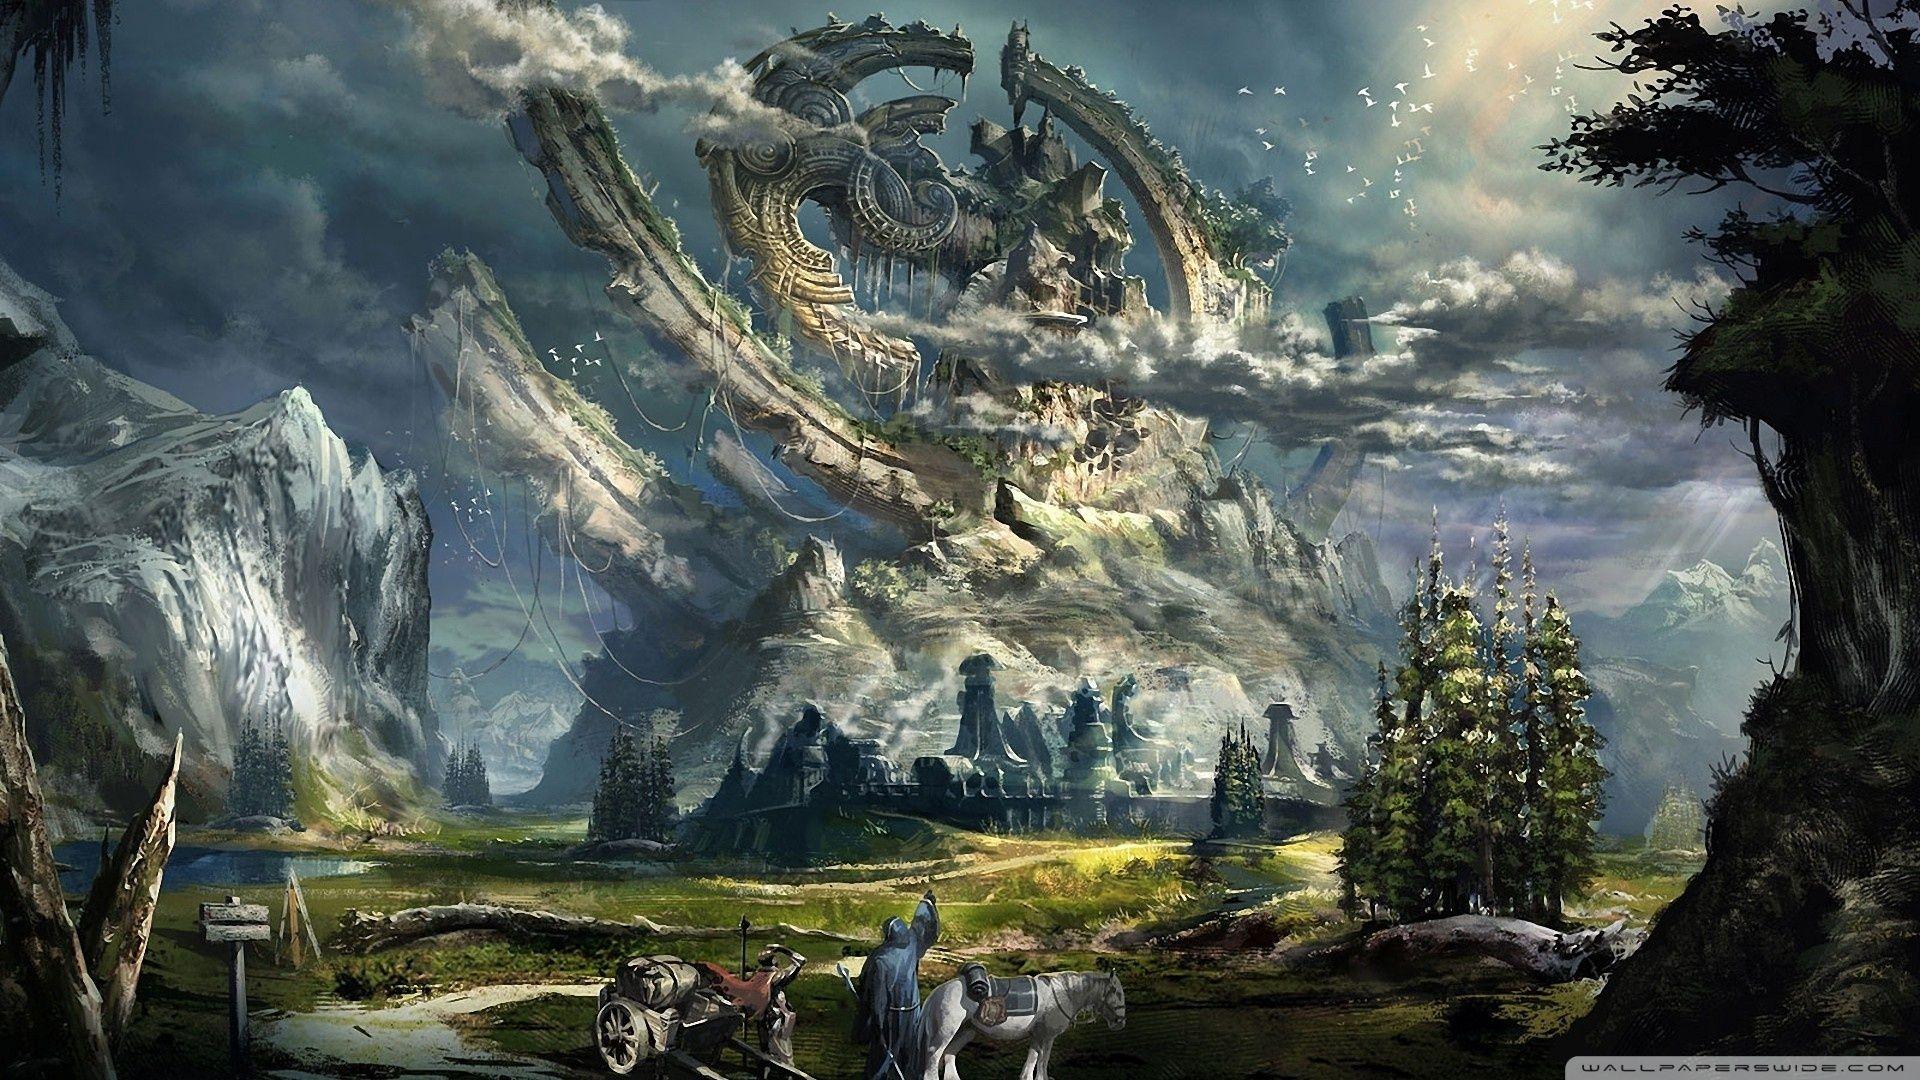 Fantasy Wallpapers 1 ファンタジーな風景 風景の壁紙